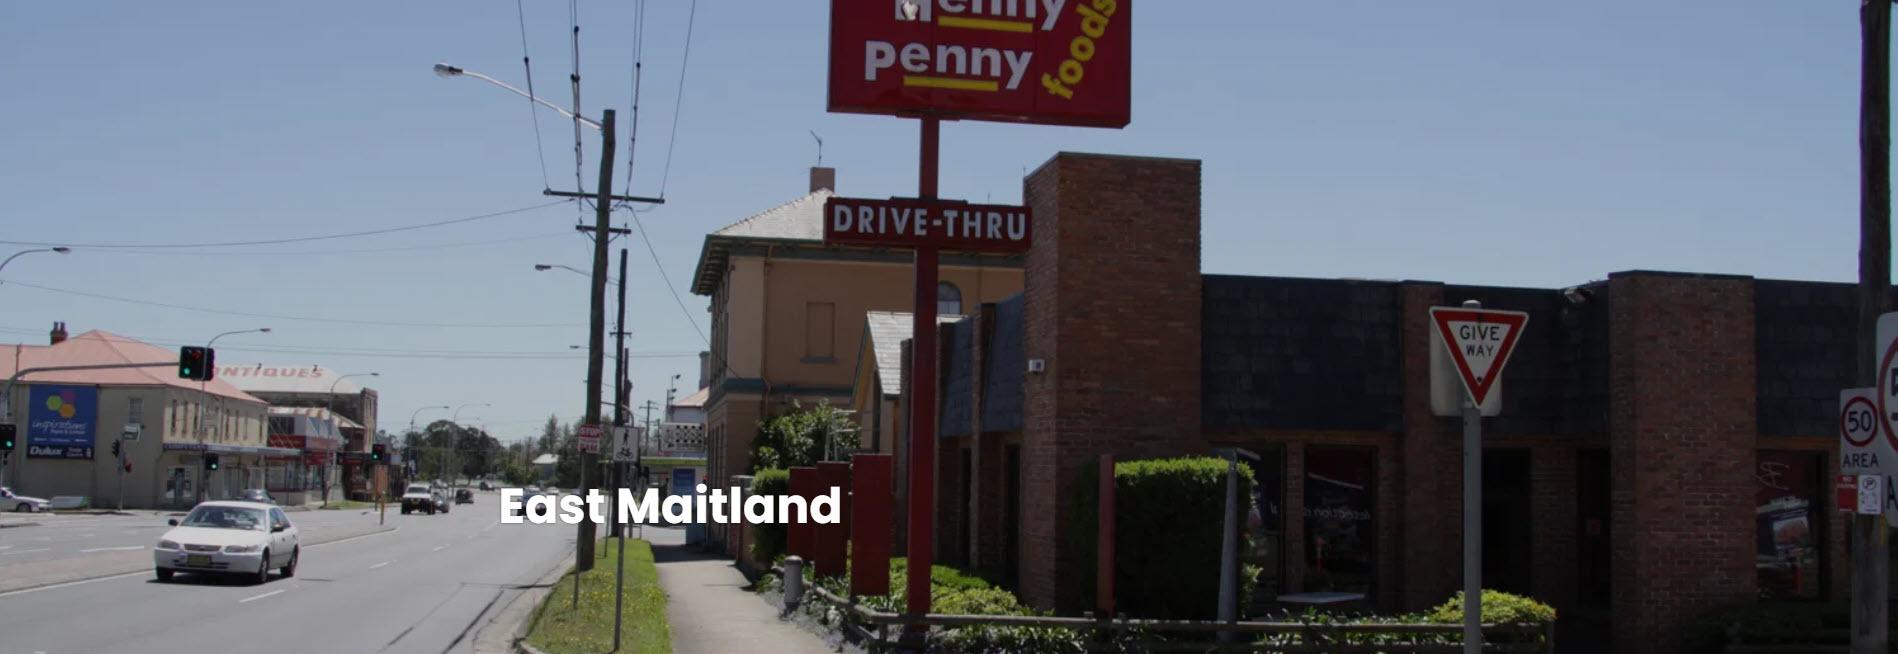 East Maitland Store